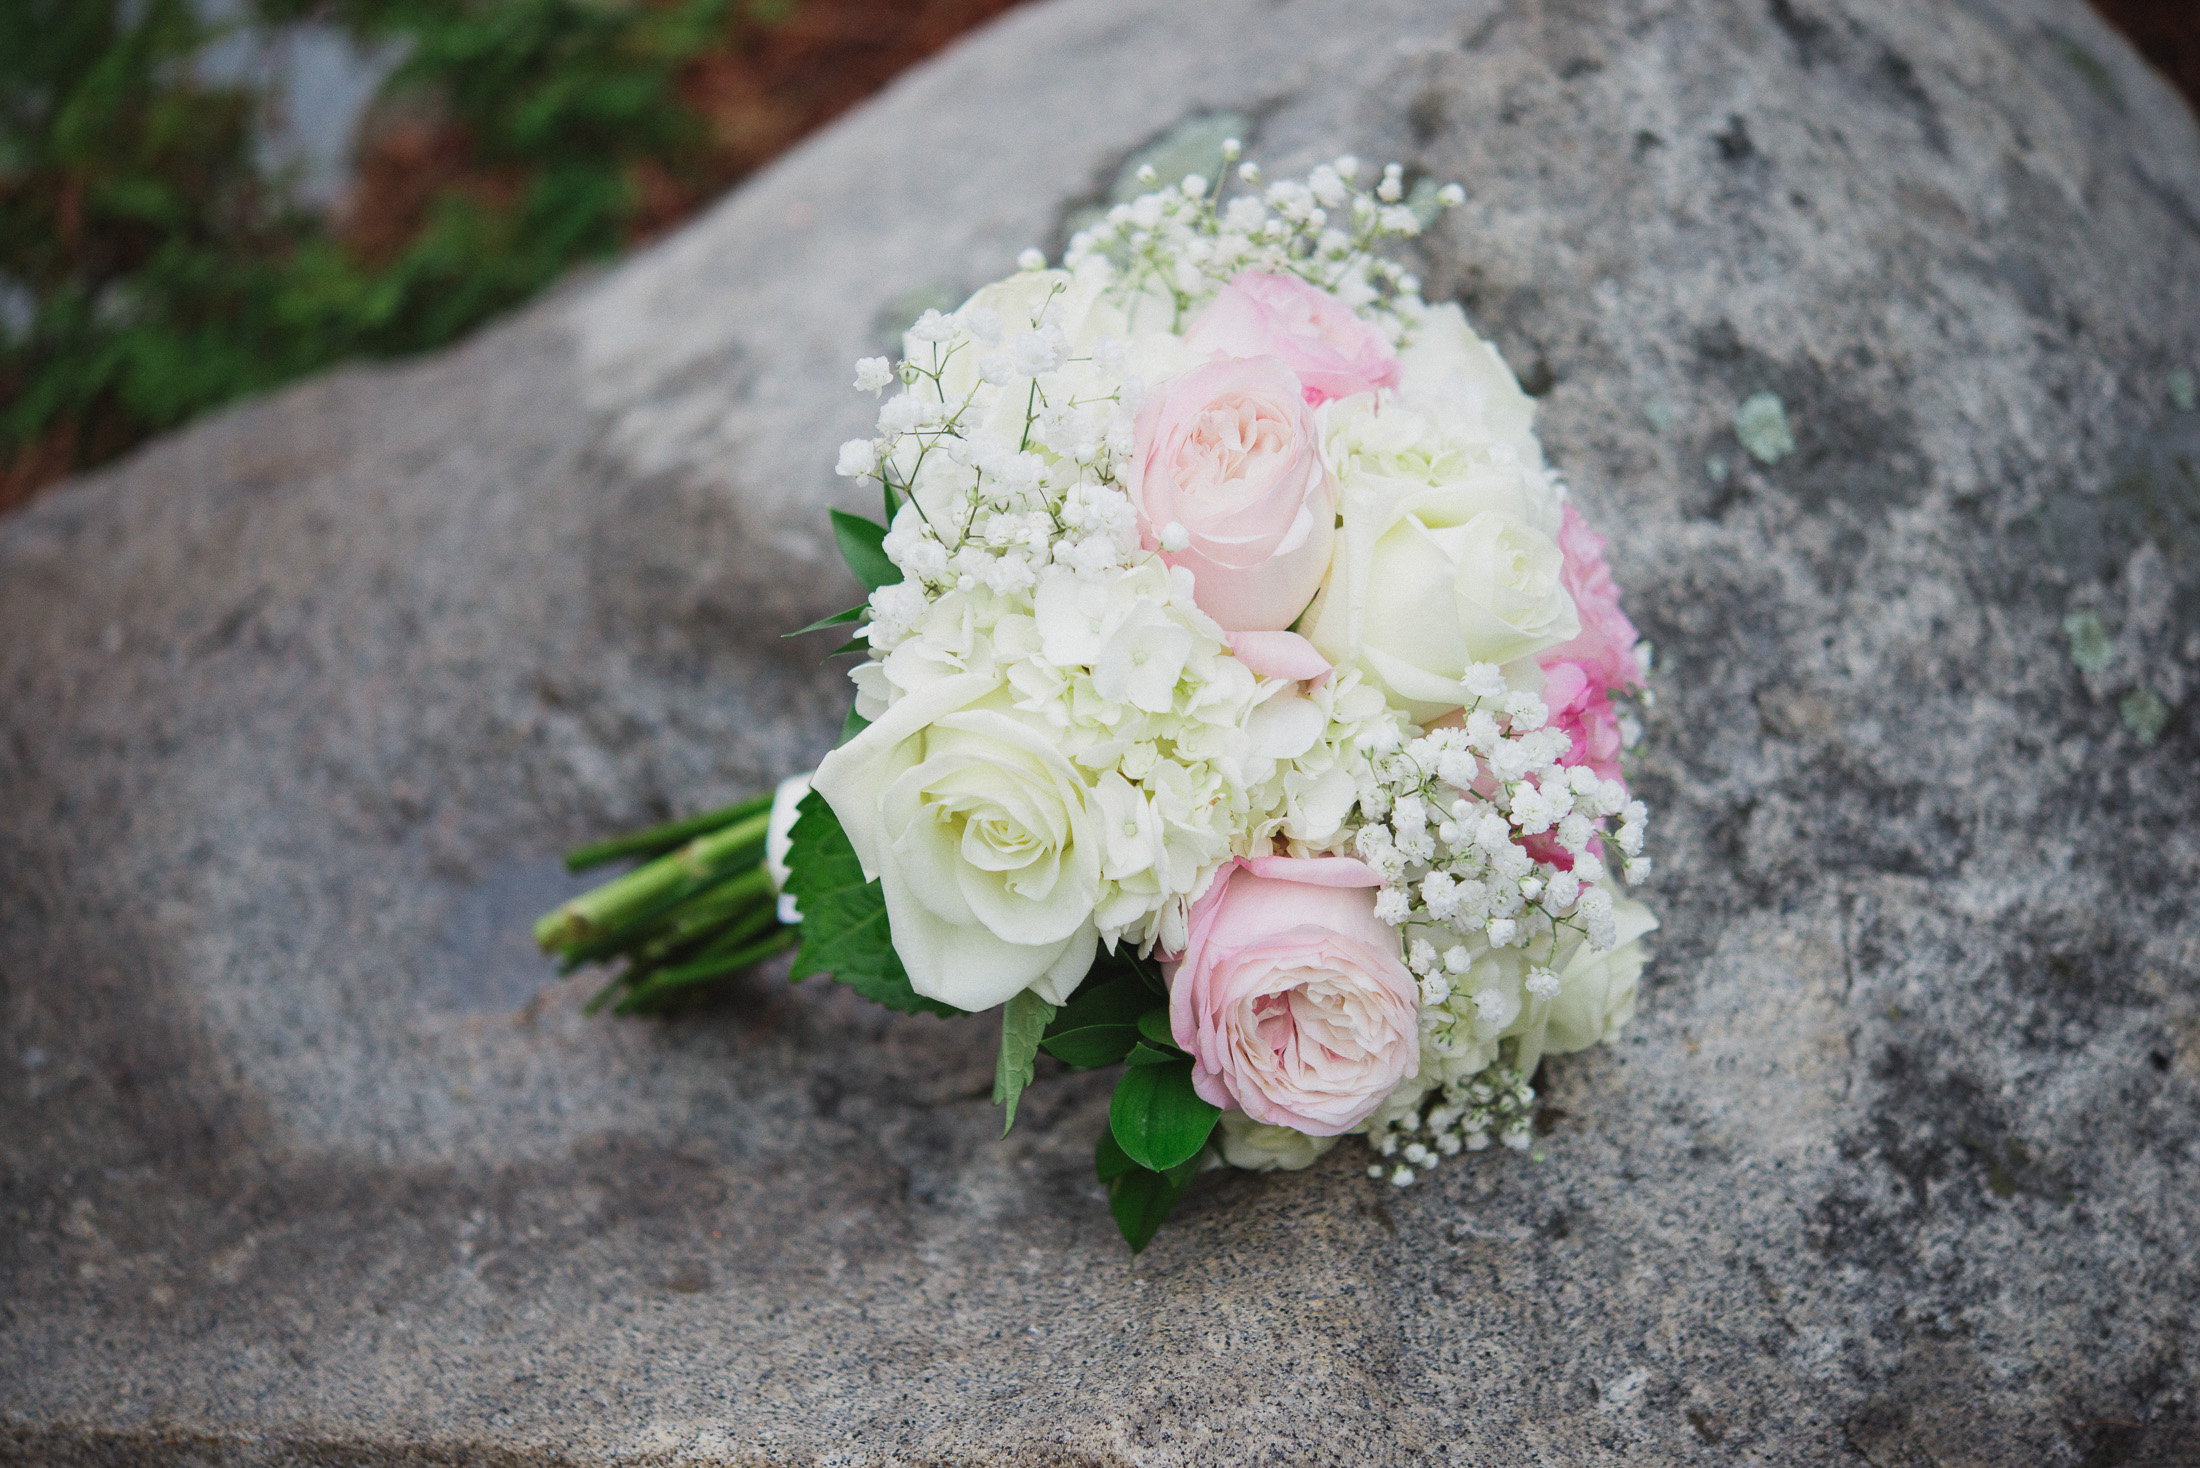 NH Wedding Photographer: Bouquet on rocks